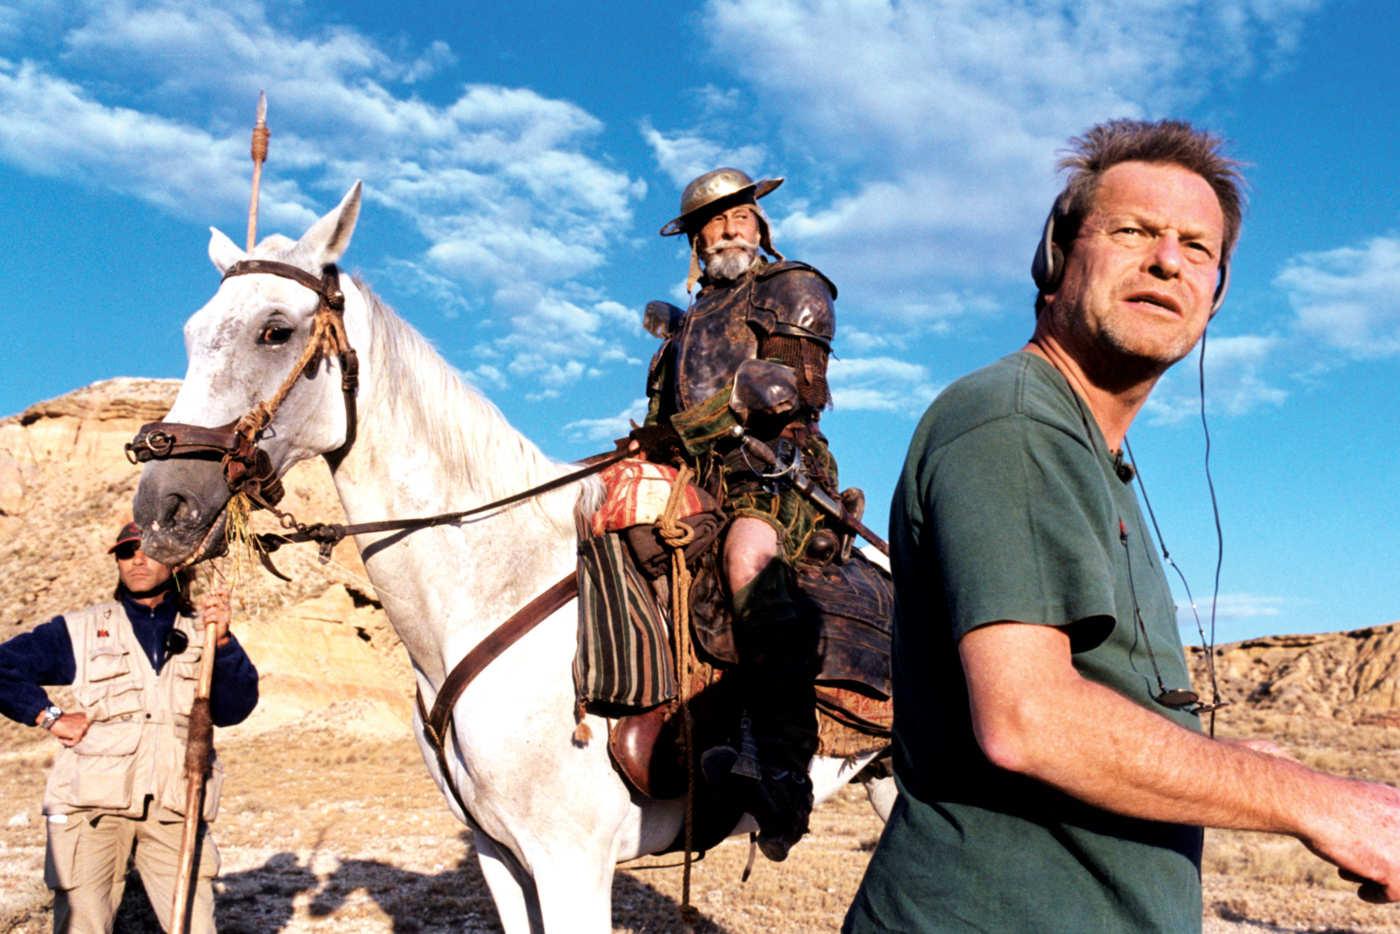 Gilliam on set in 2000